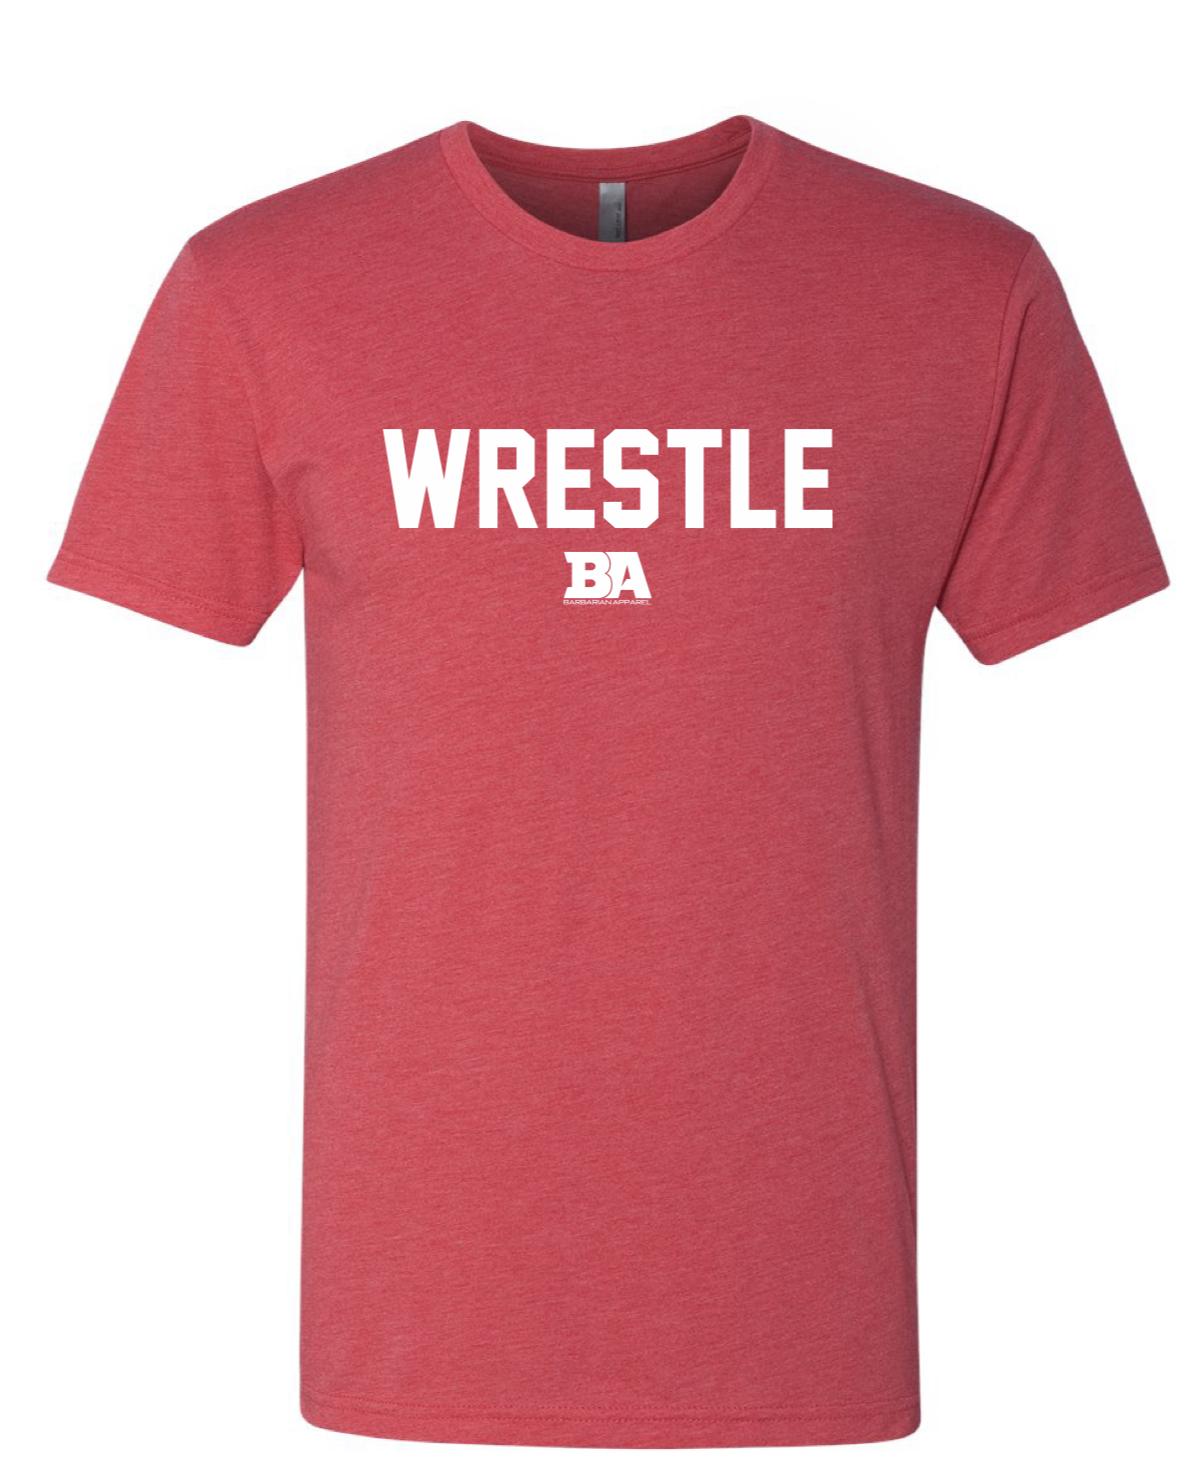 -Wrestle Tri Blend Shirt